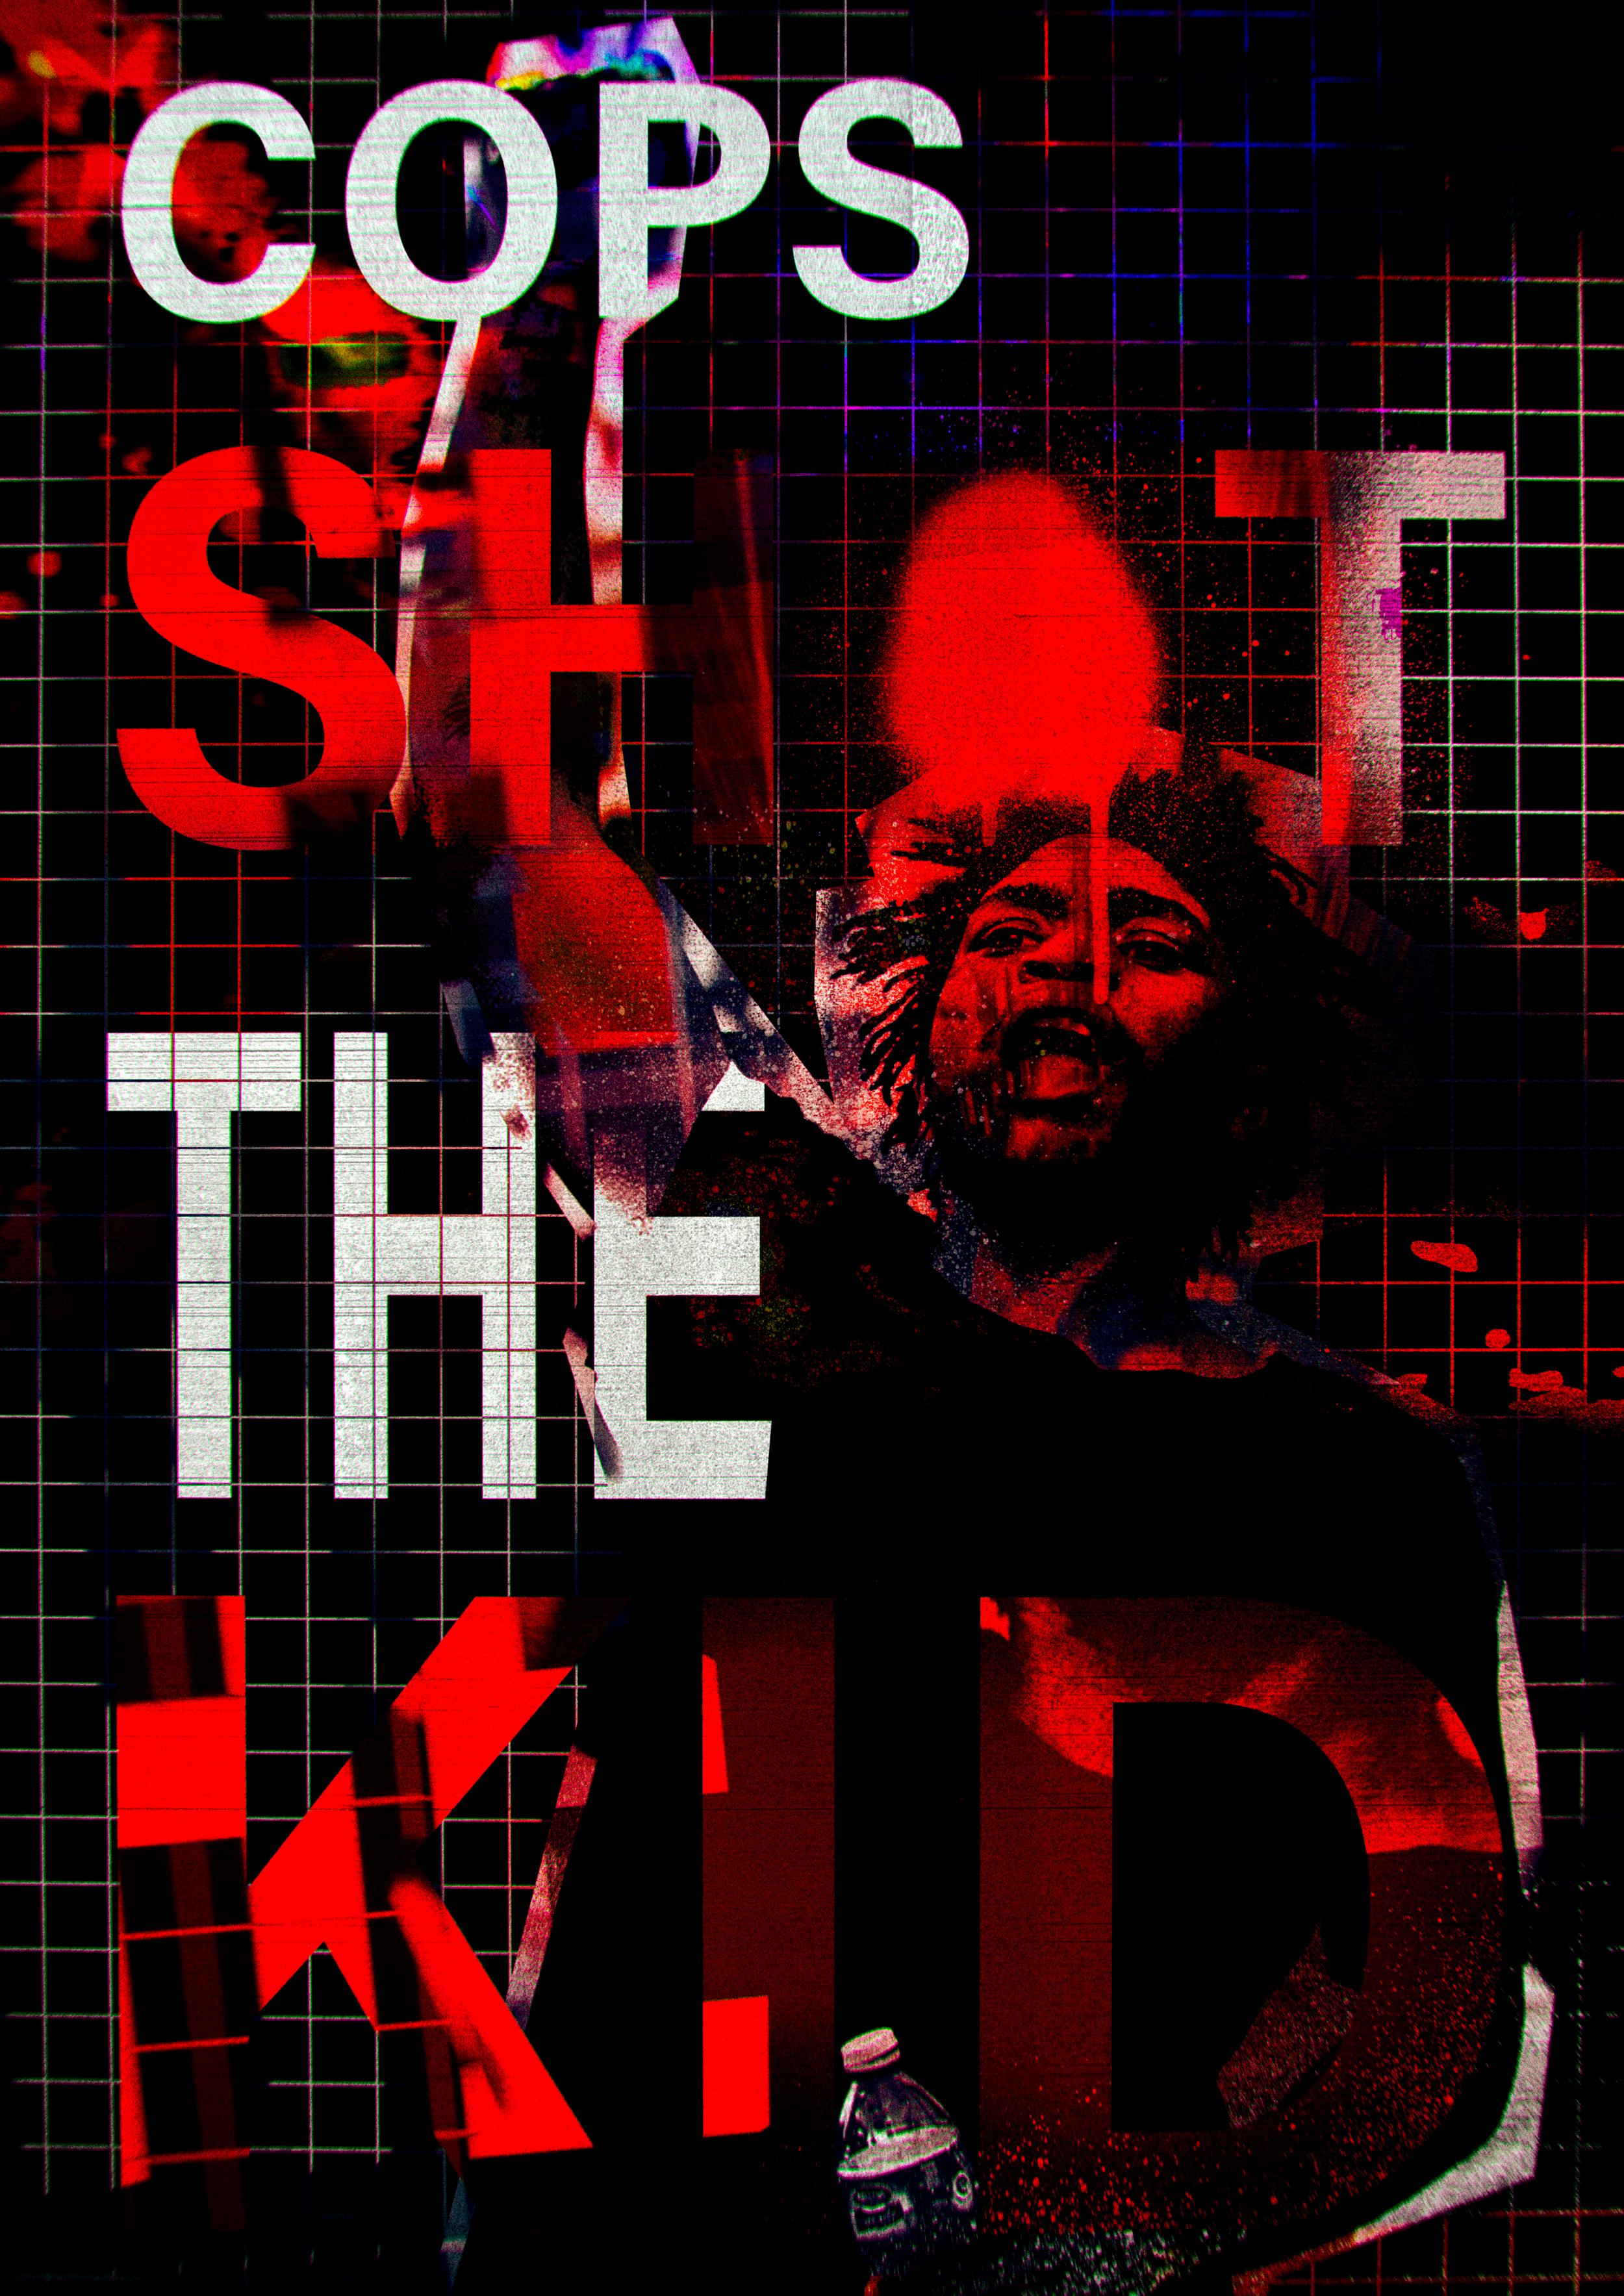 Cops Shot The Kid - 03-07-18